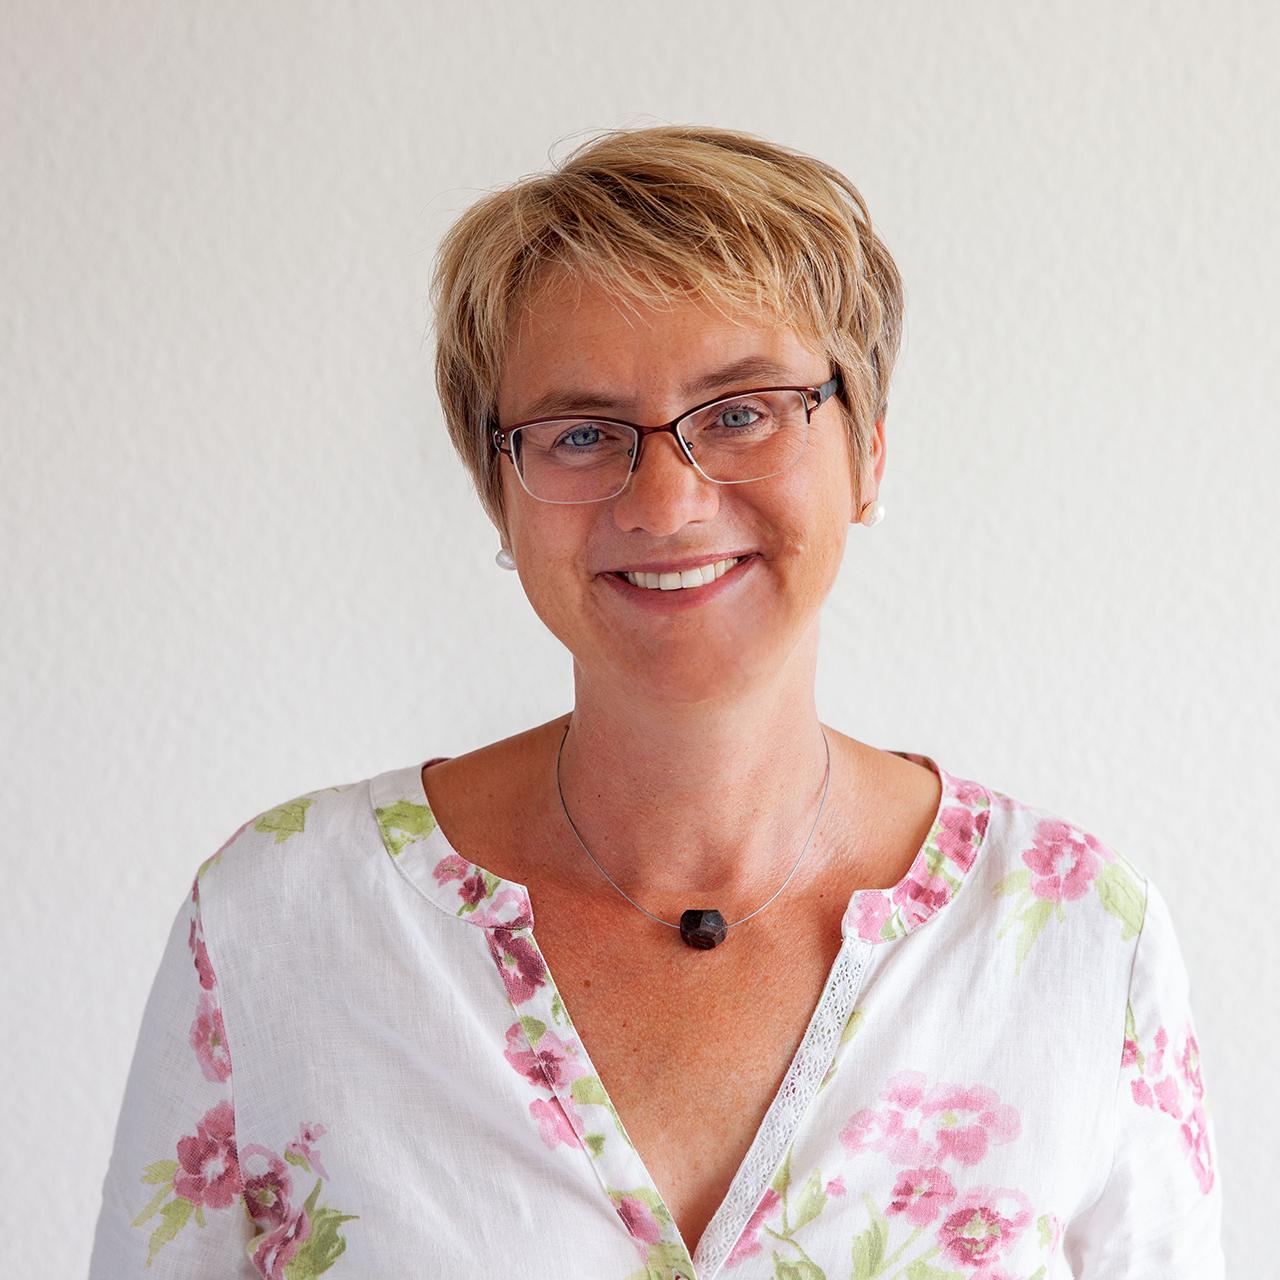 Marie-Luise Reitz